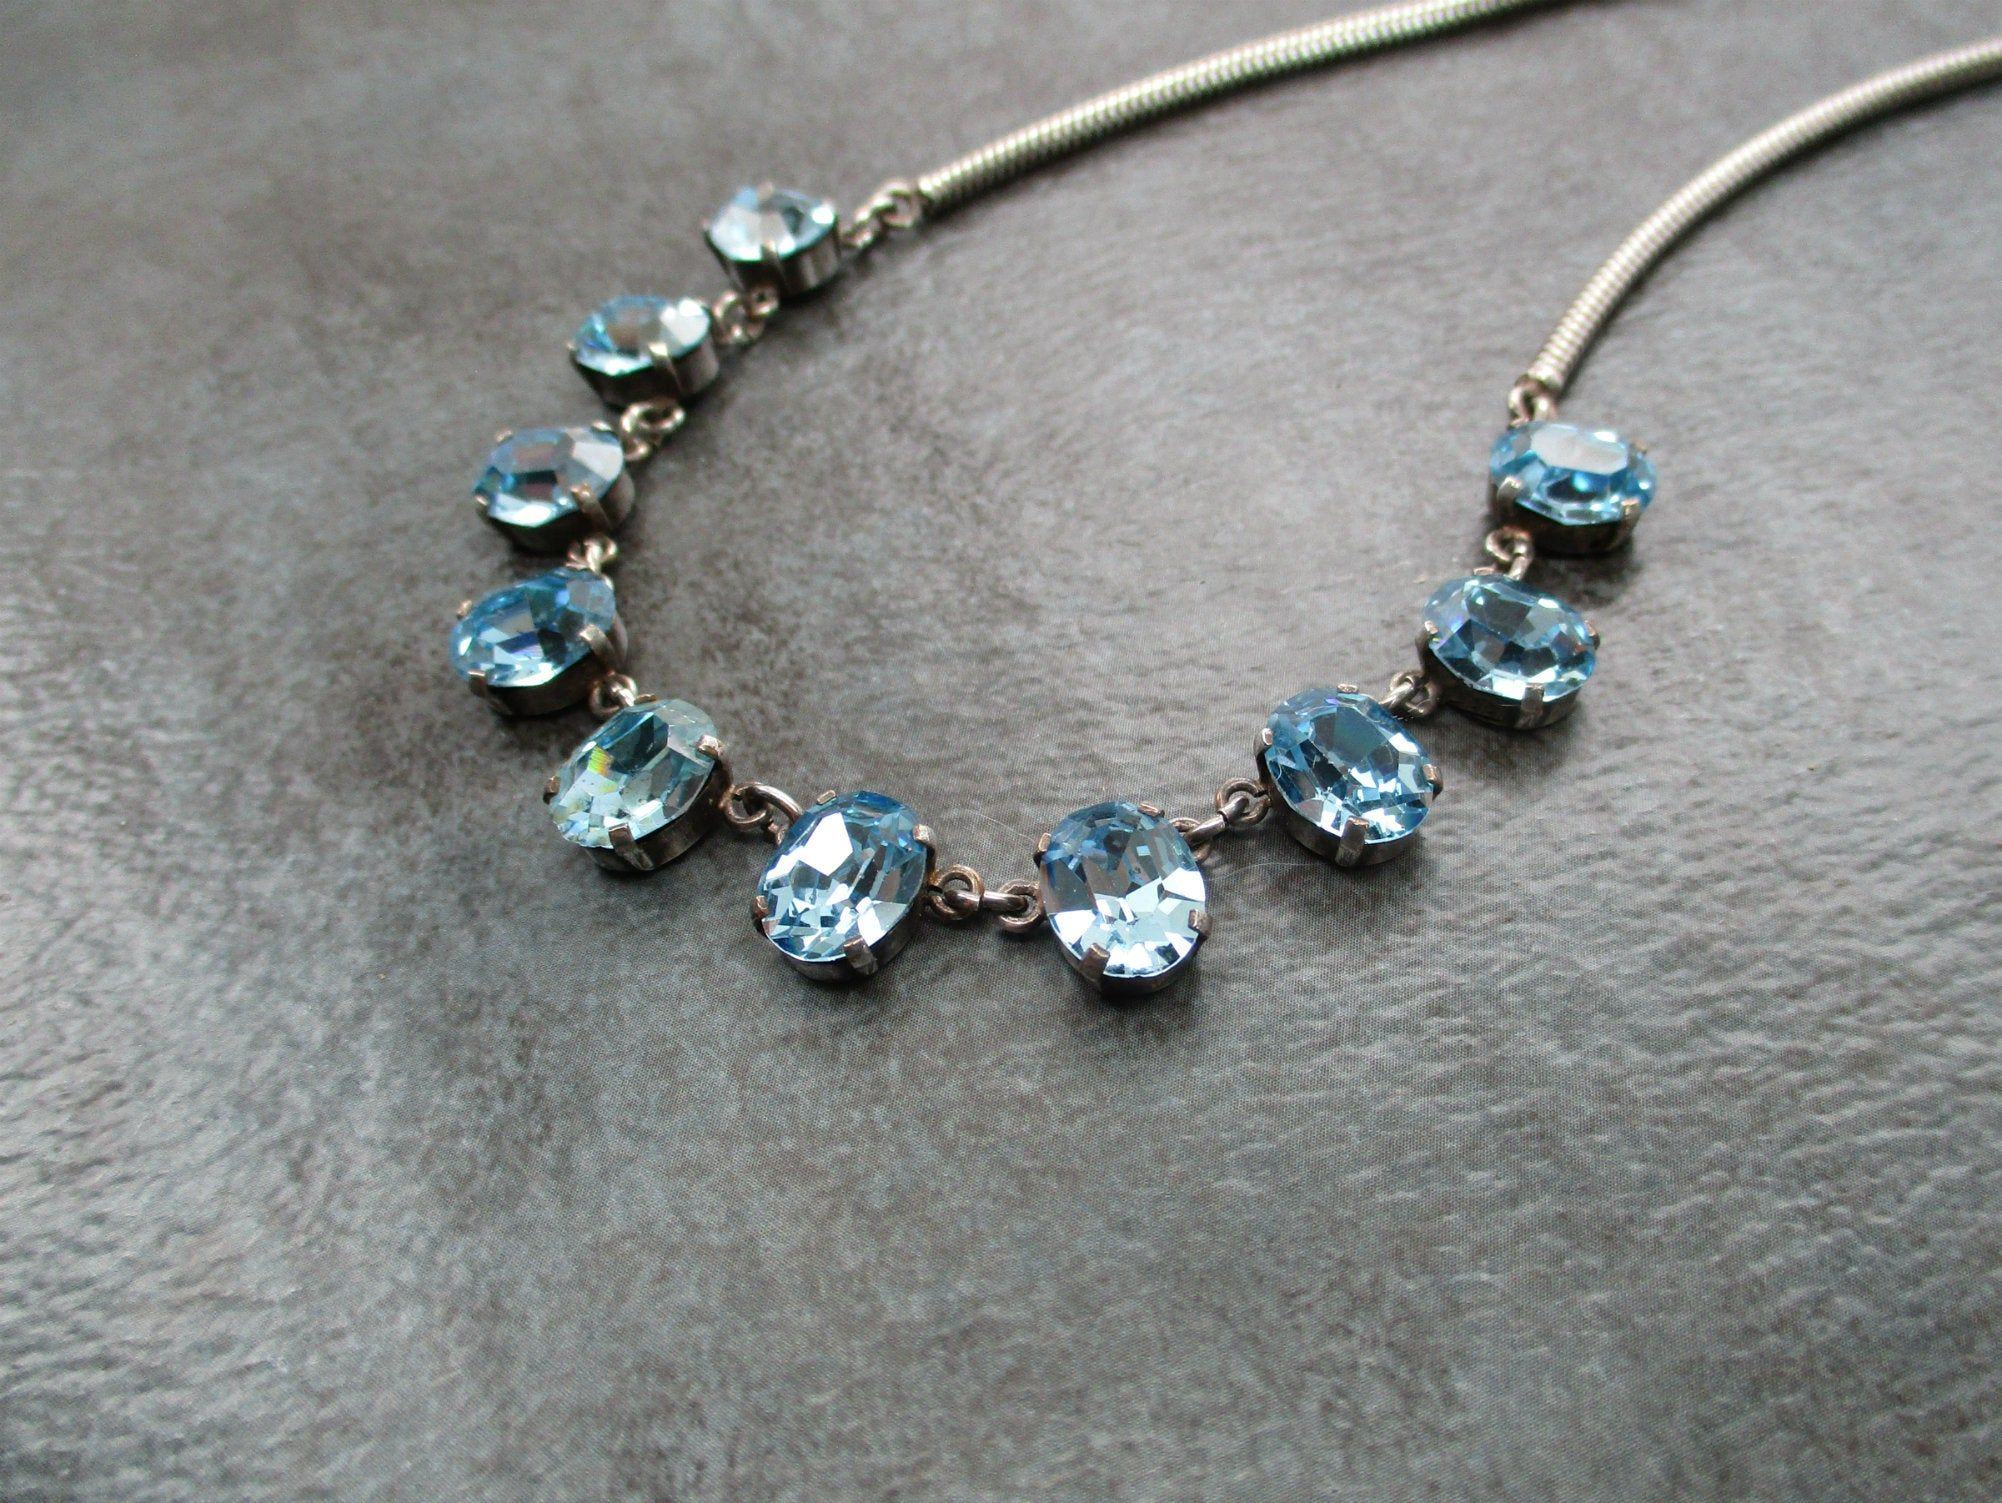 Vintage Blue Beaded and Rhinestone Choker Necklace-silver tone metal-hook clasp-rhinestone chain bridesmaid gift-something blue bridal gift